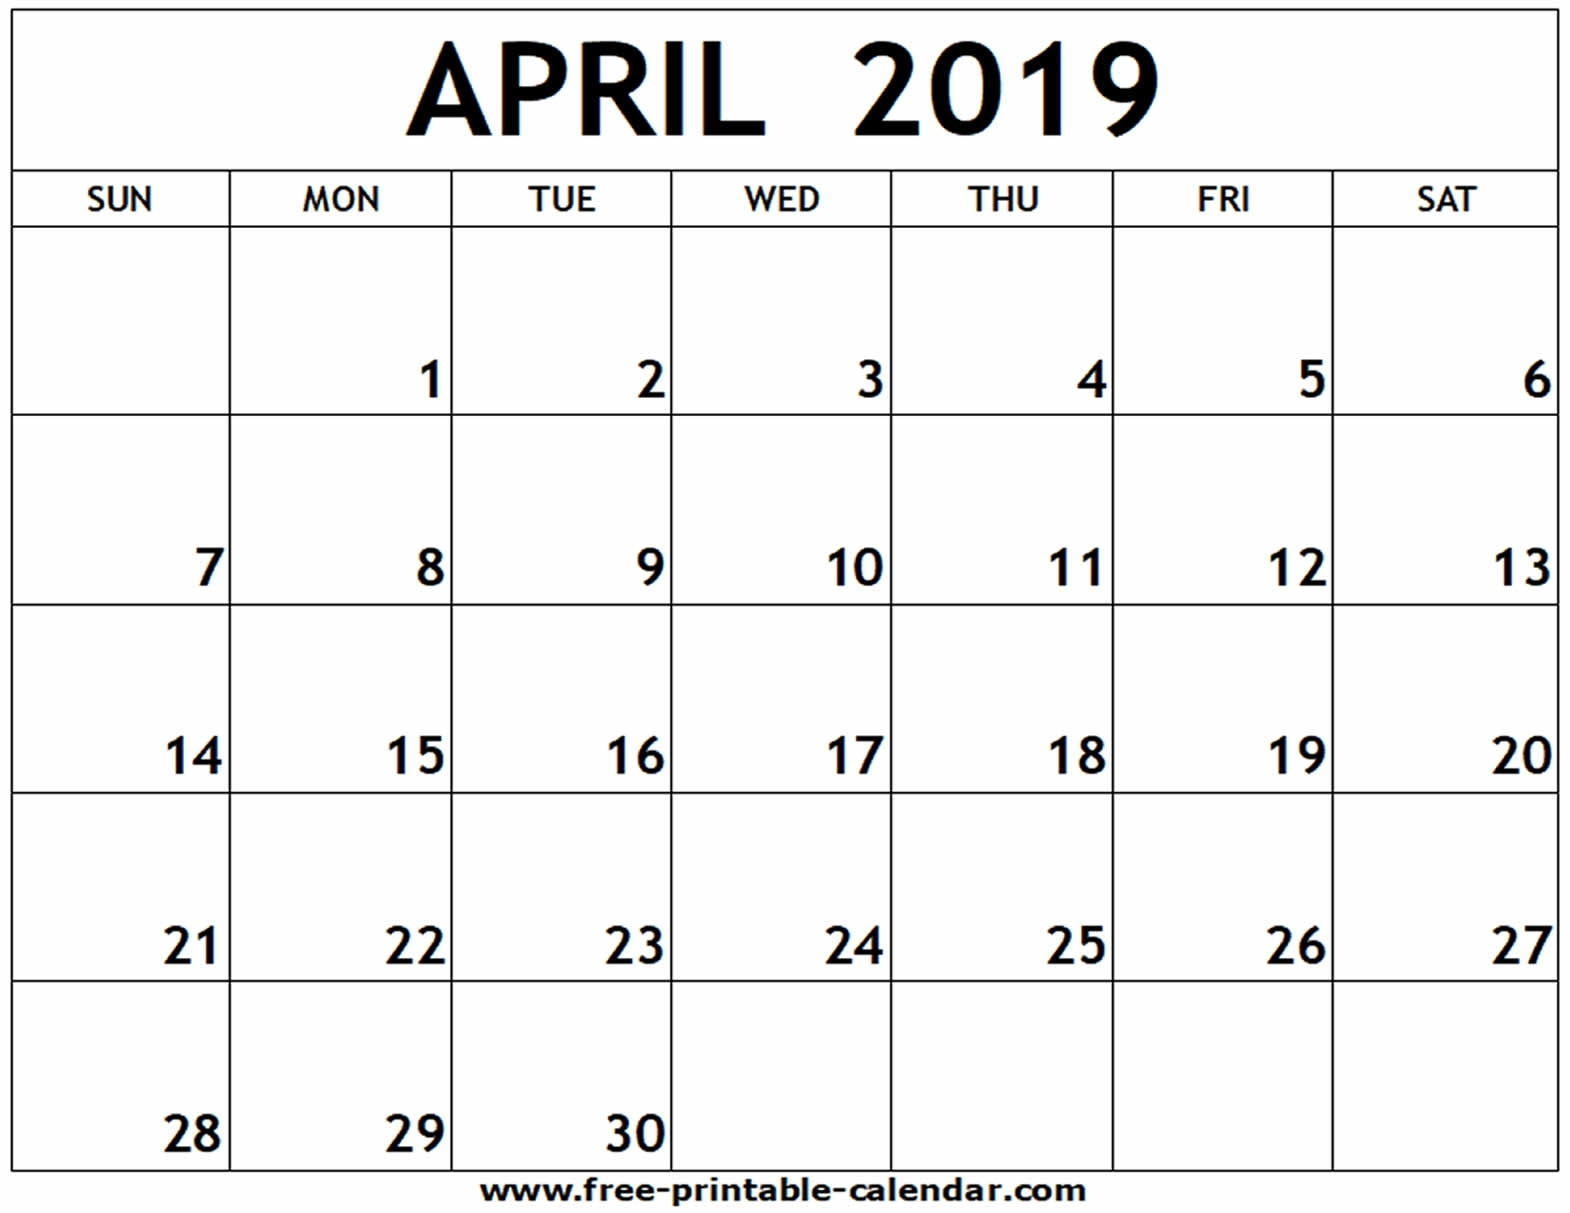 April 2019 Printable Calendar - Free-Printable-Calendar